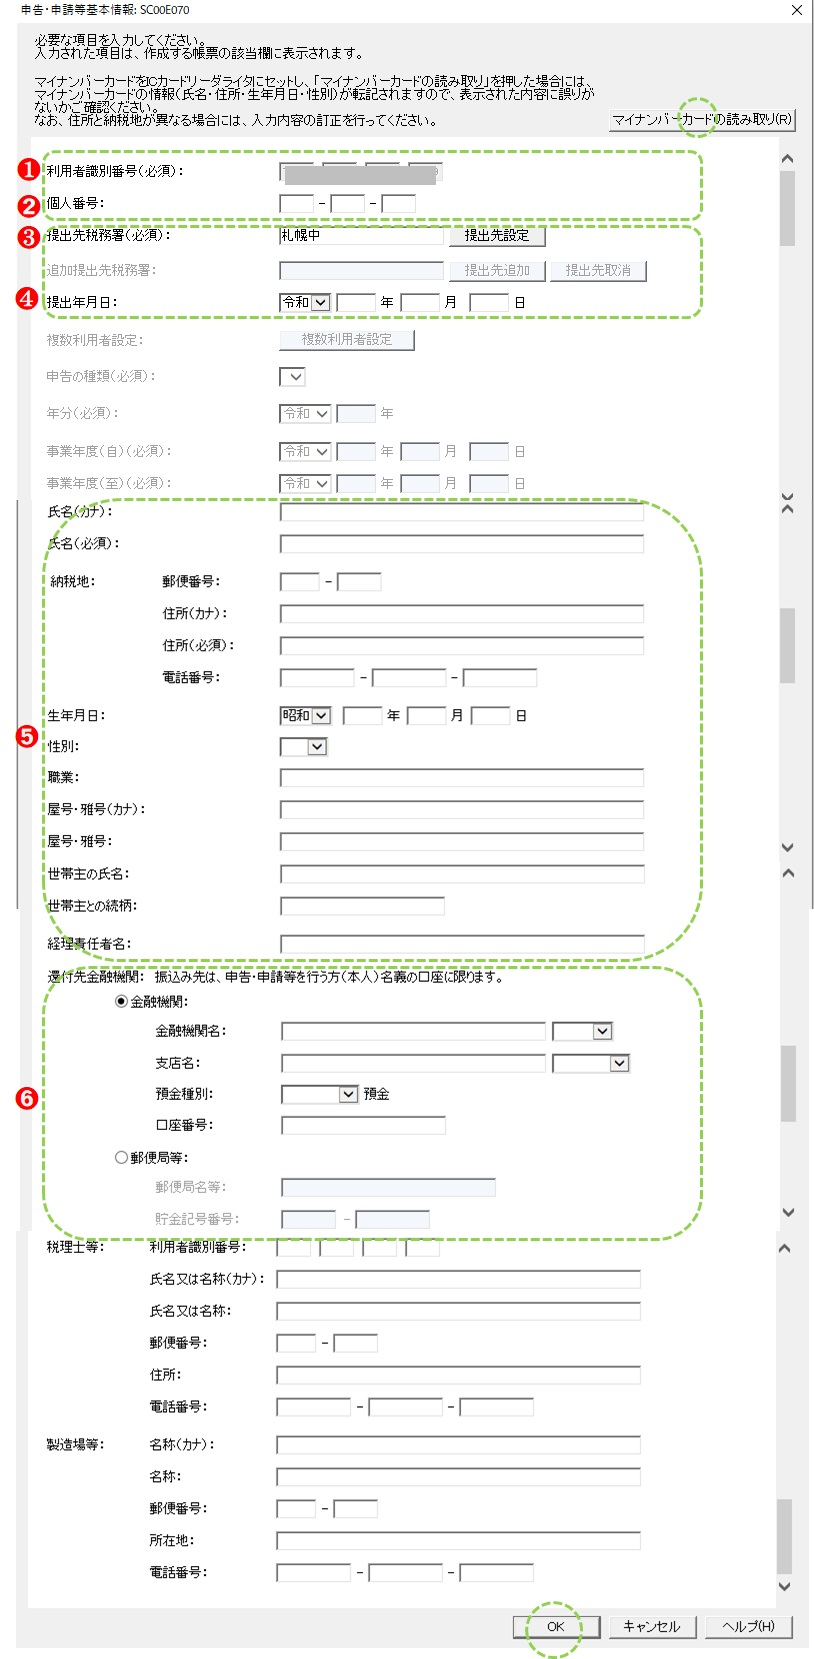 e-taxソフト 個人事業の開業・廃業届出書 申請書作成手順4_基本情報入力